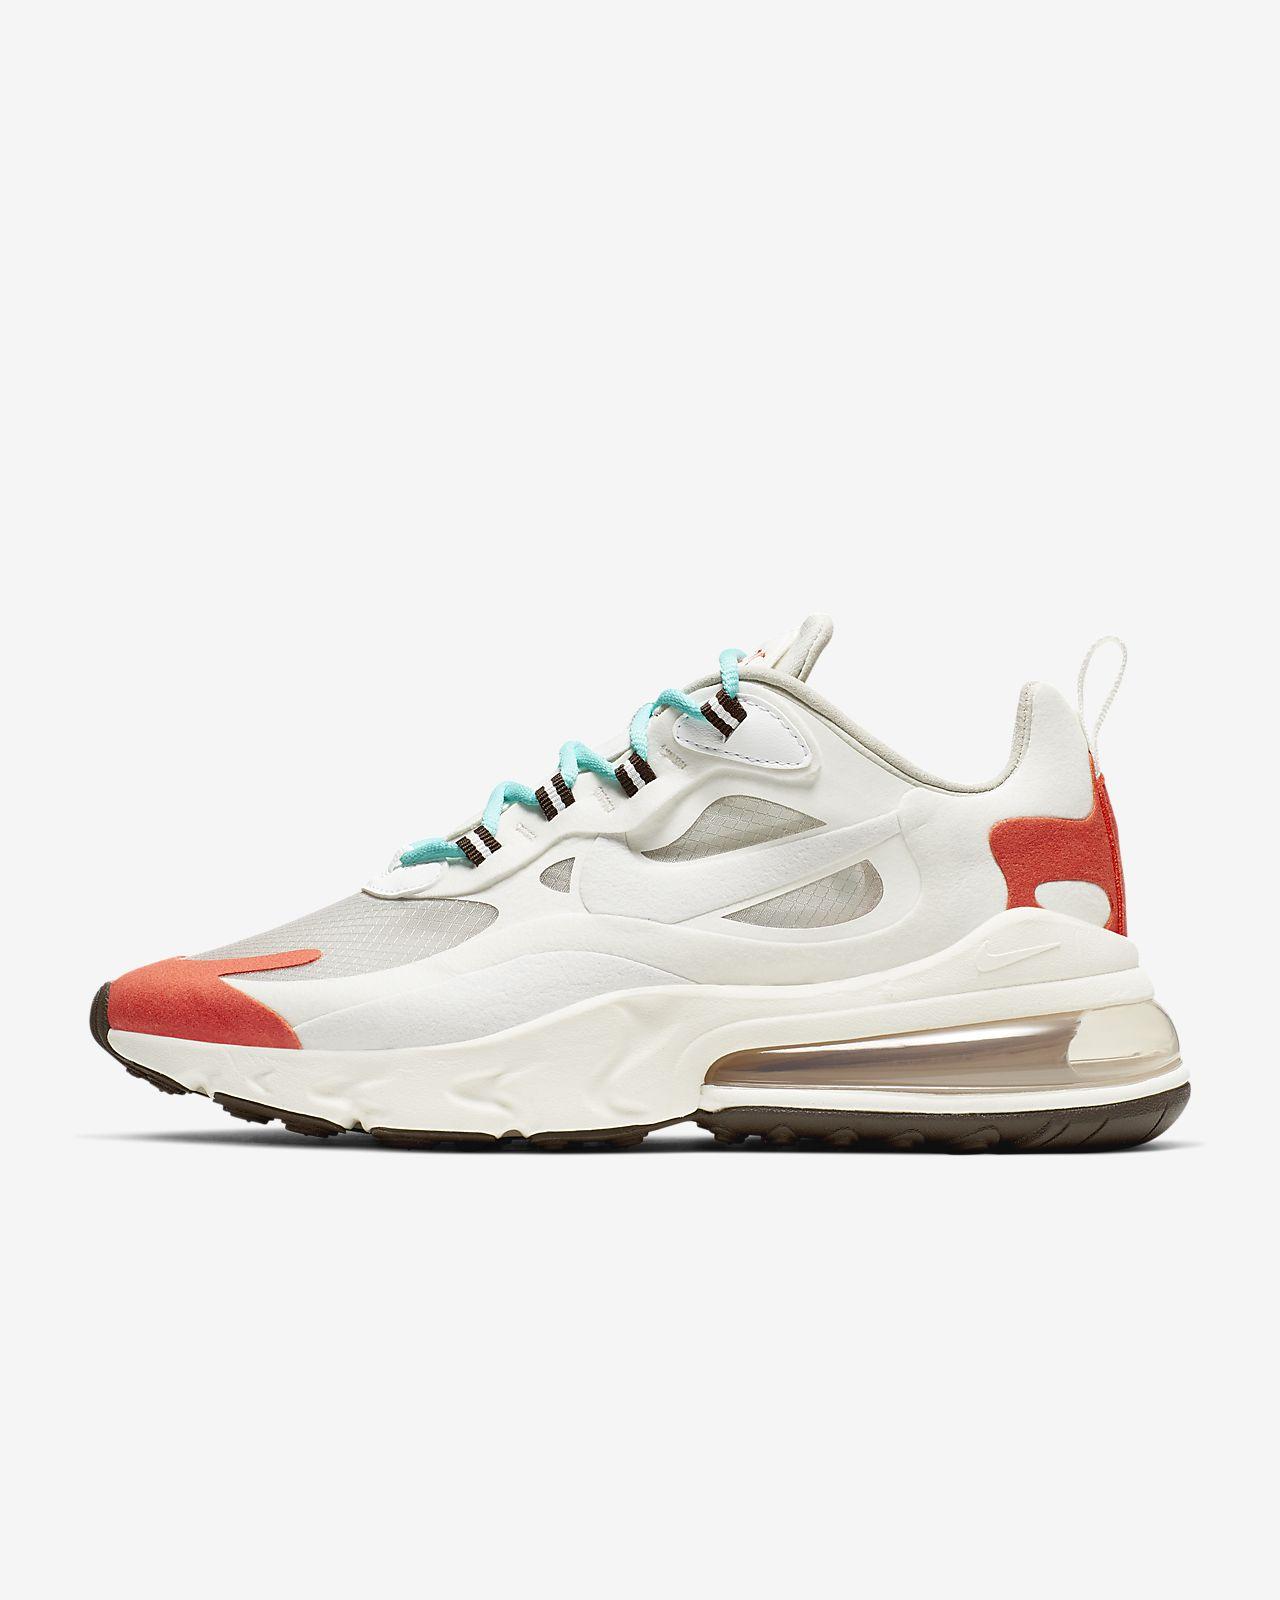 Nike Air Max 270 React (Mid-Century) Kadın Ayakkabısı